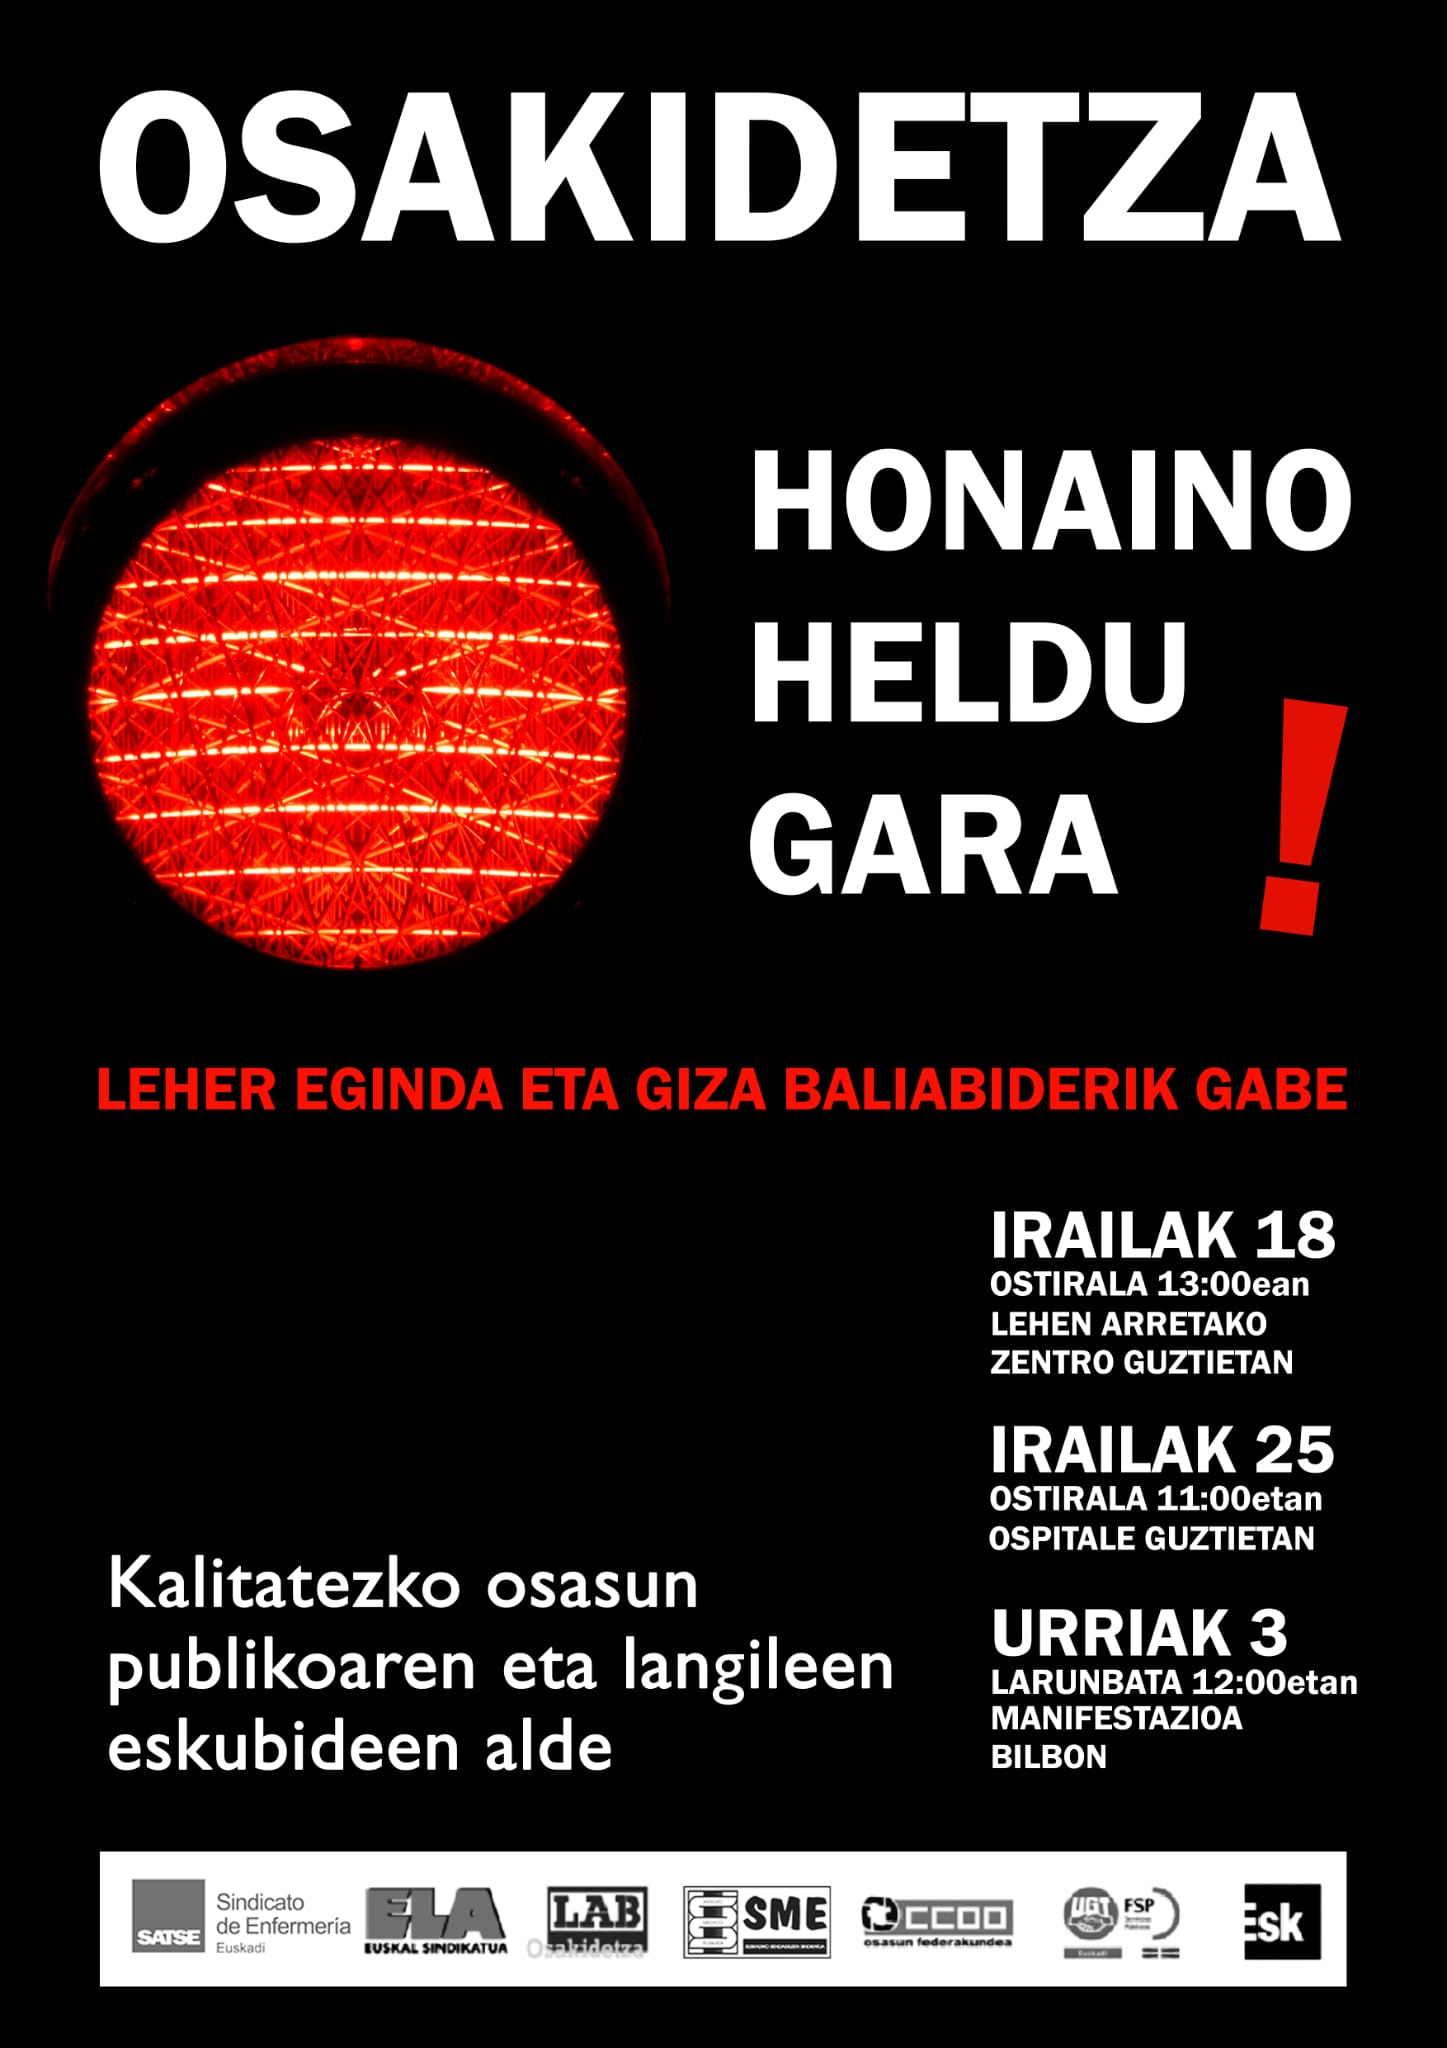 Kalitatezko osasun publikoaren eta langileen eskubideen alde. El PCE-EPK llama a la movilización ante la convocatoria de lucha de los sindicatos de sanidad.